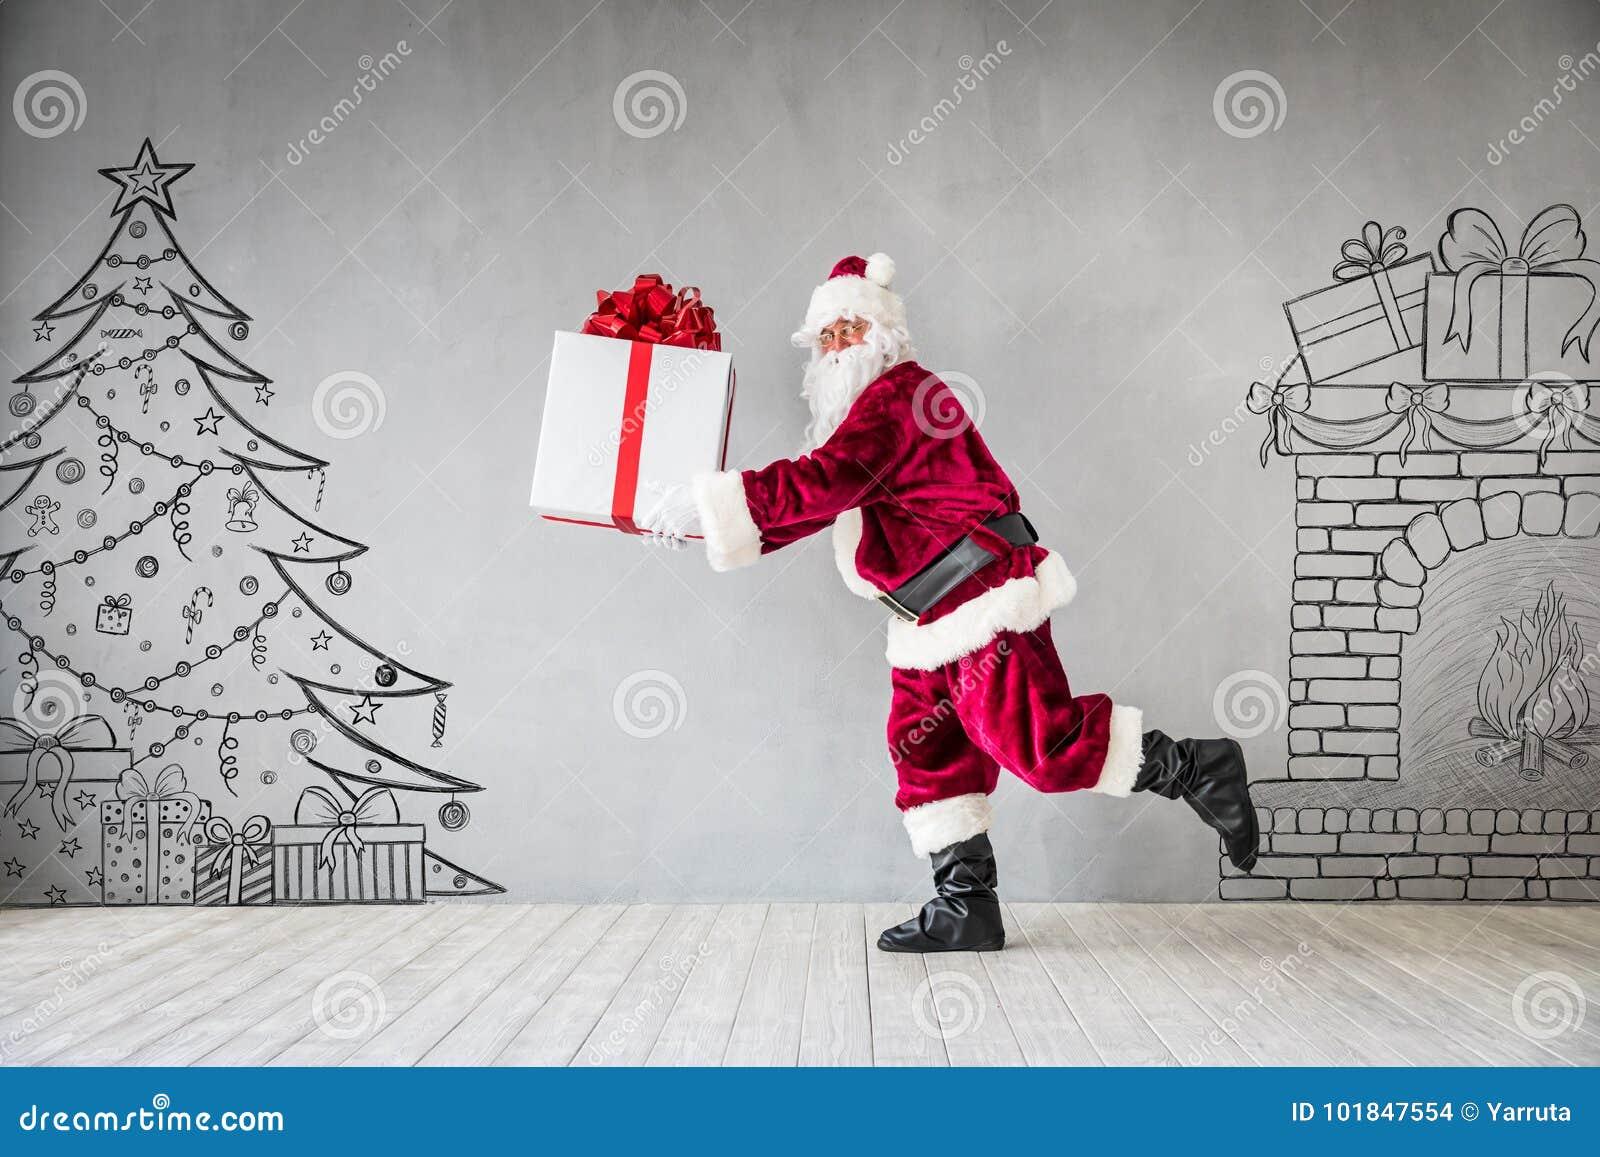 Santa Claus Christmas Xmas Holiday Concept